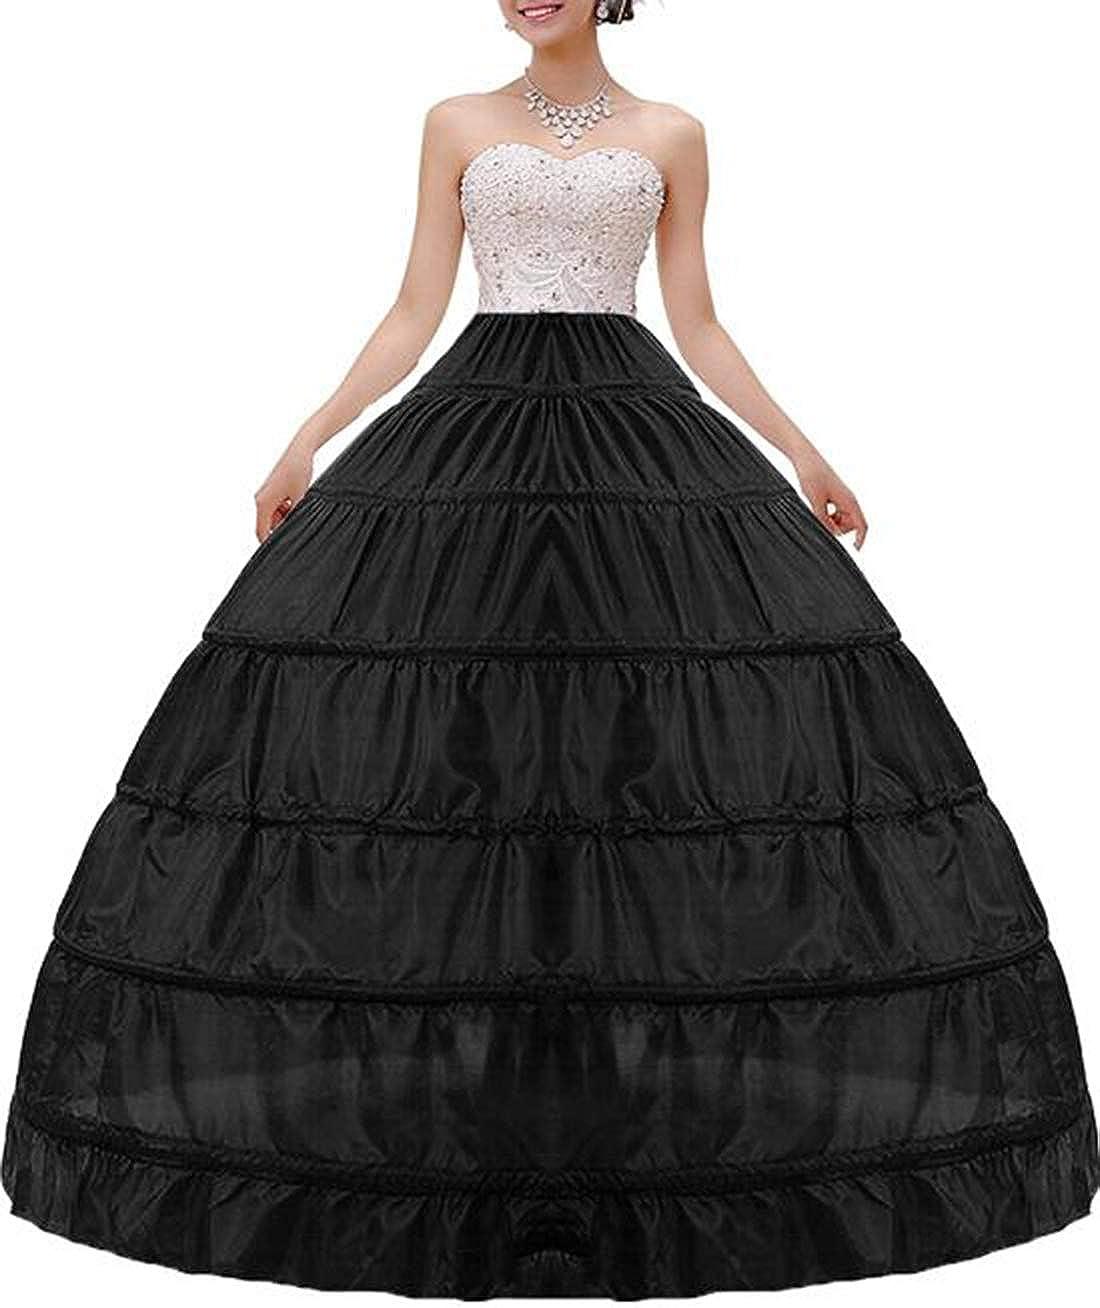 bdf29289c6 MISSVEIL Women Crinoline Petticoat Hoop Skirt Slips Long Underskirt for Wedding  Dress Ball Gown Black at Amazon Women s Clothing store